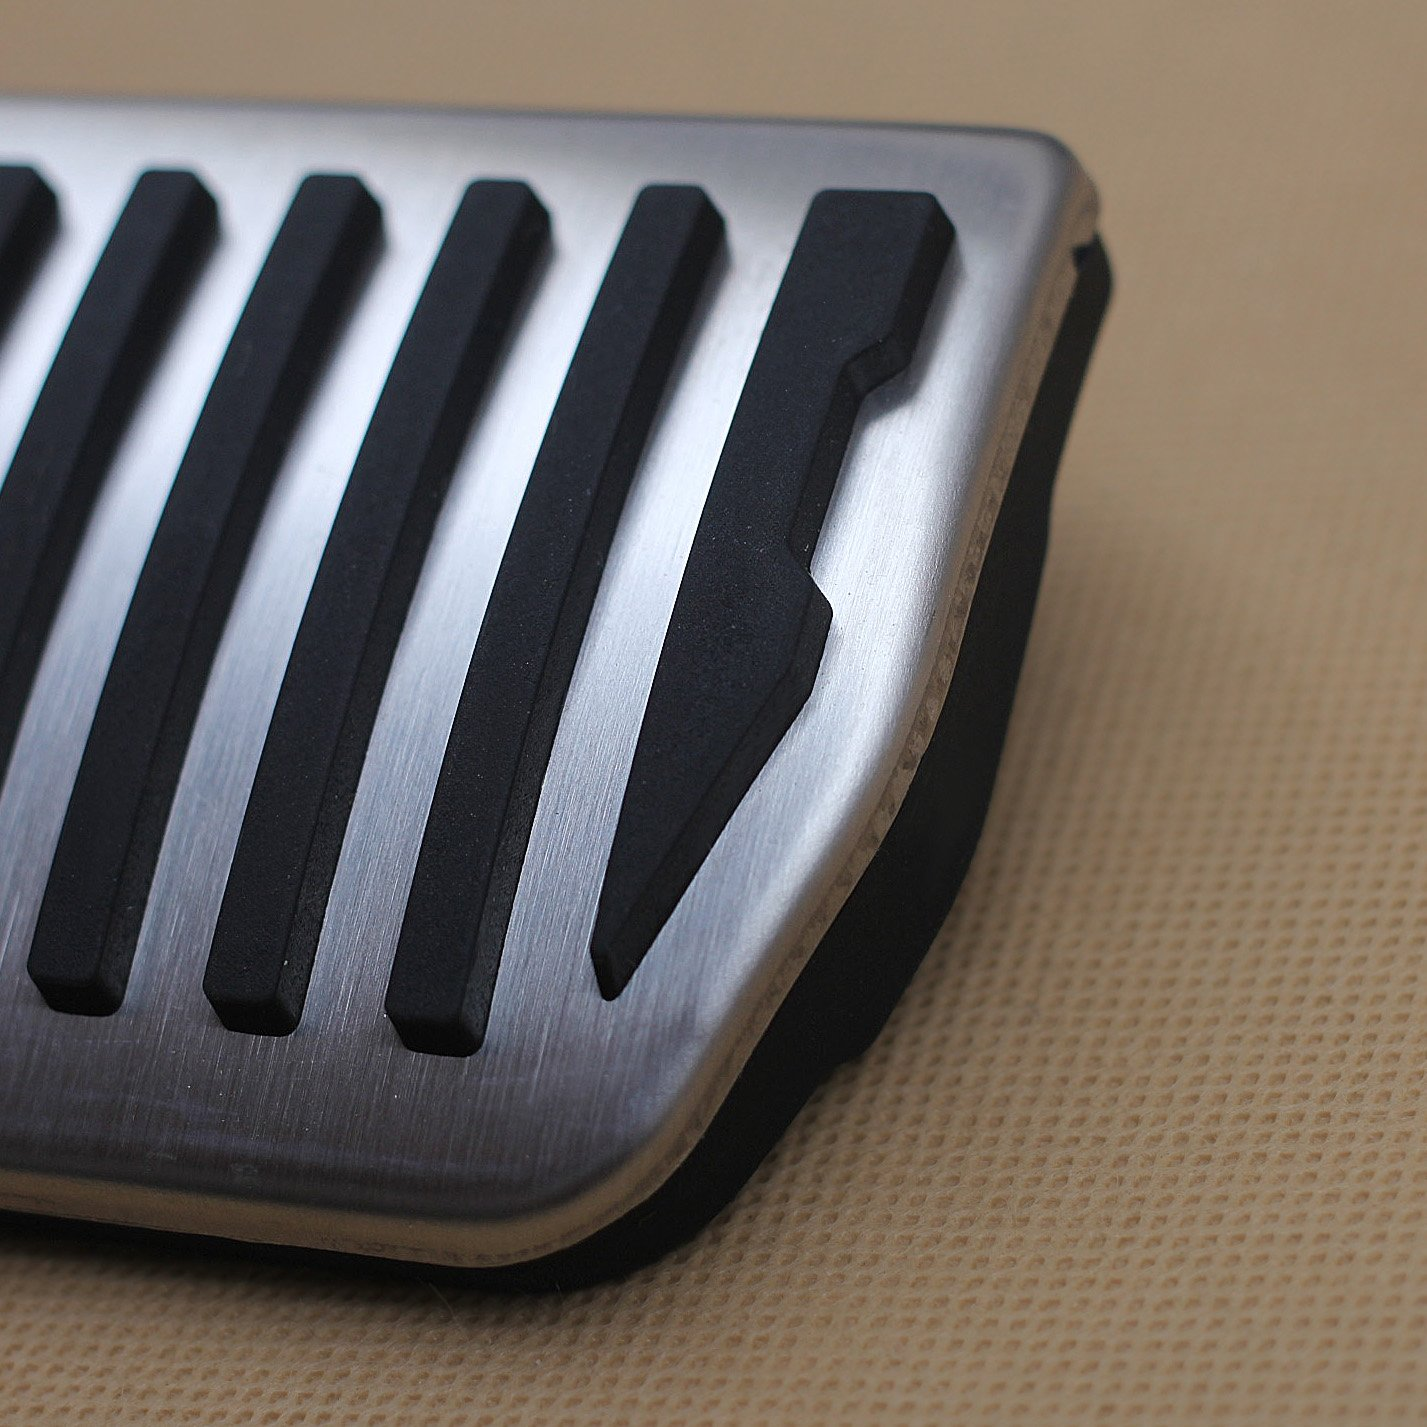 Covercraft Custom Fit Car Cover for Select Buick Park Avenue Models FS12693F5 Black Fleeced Satin